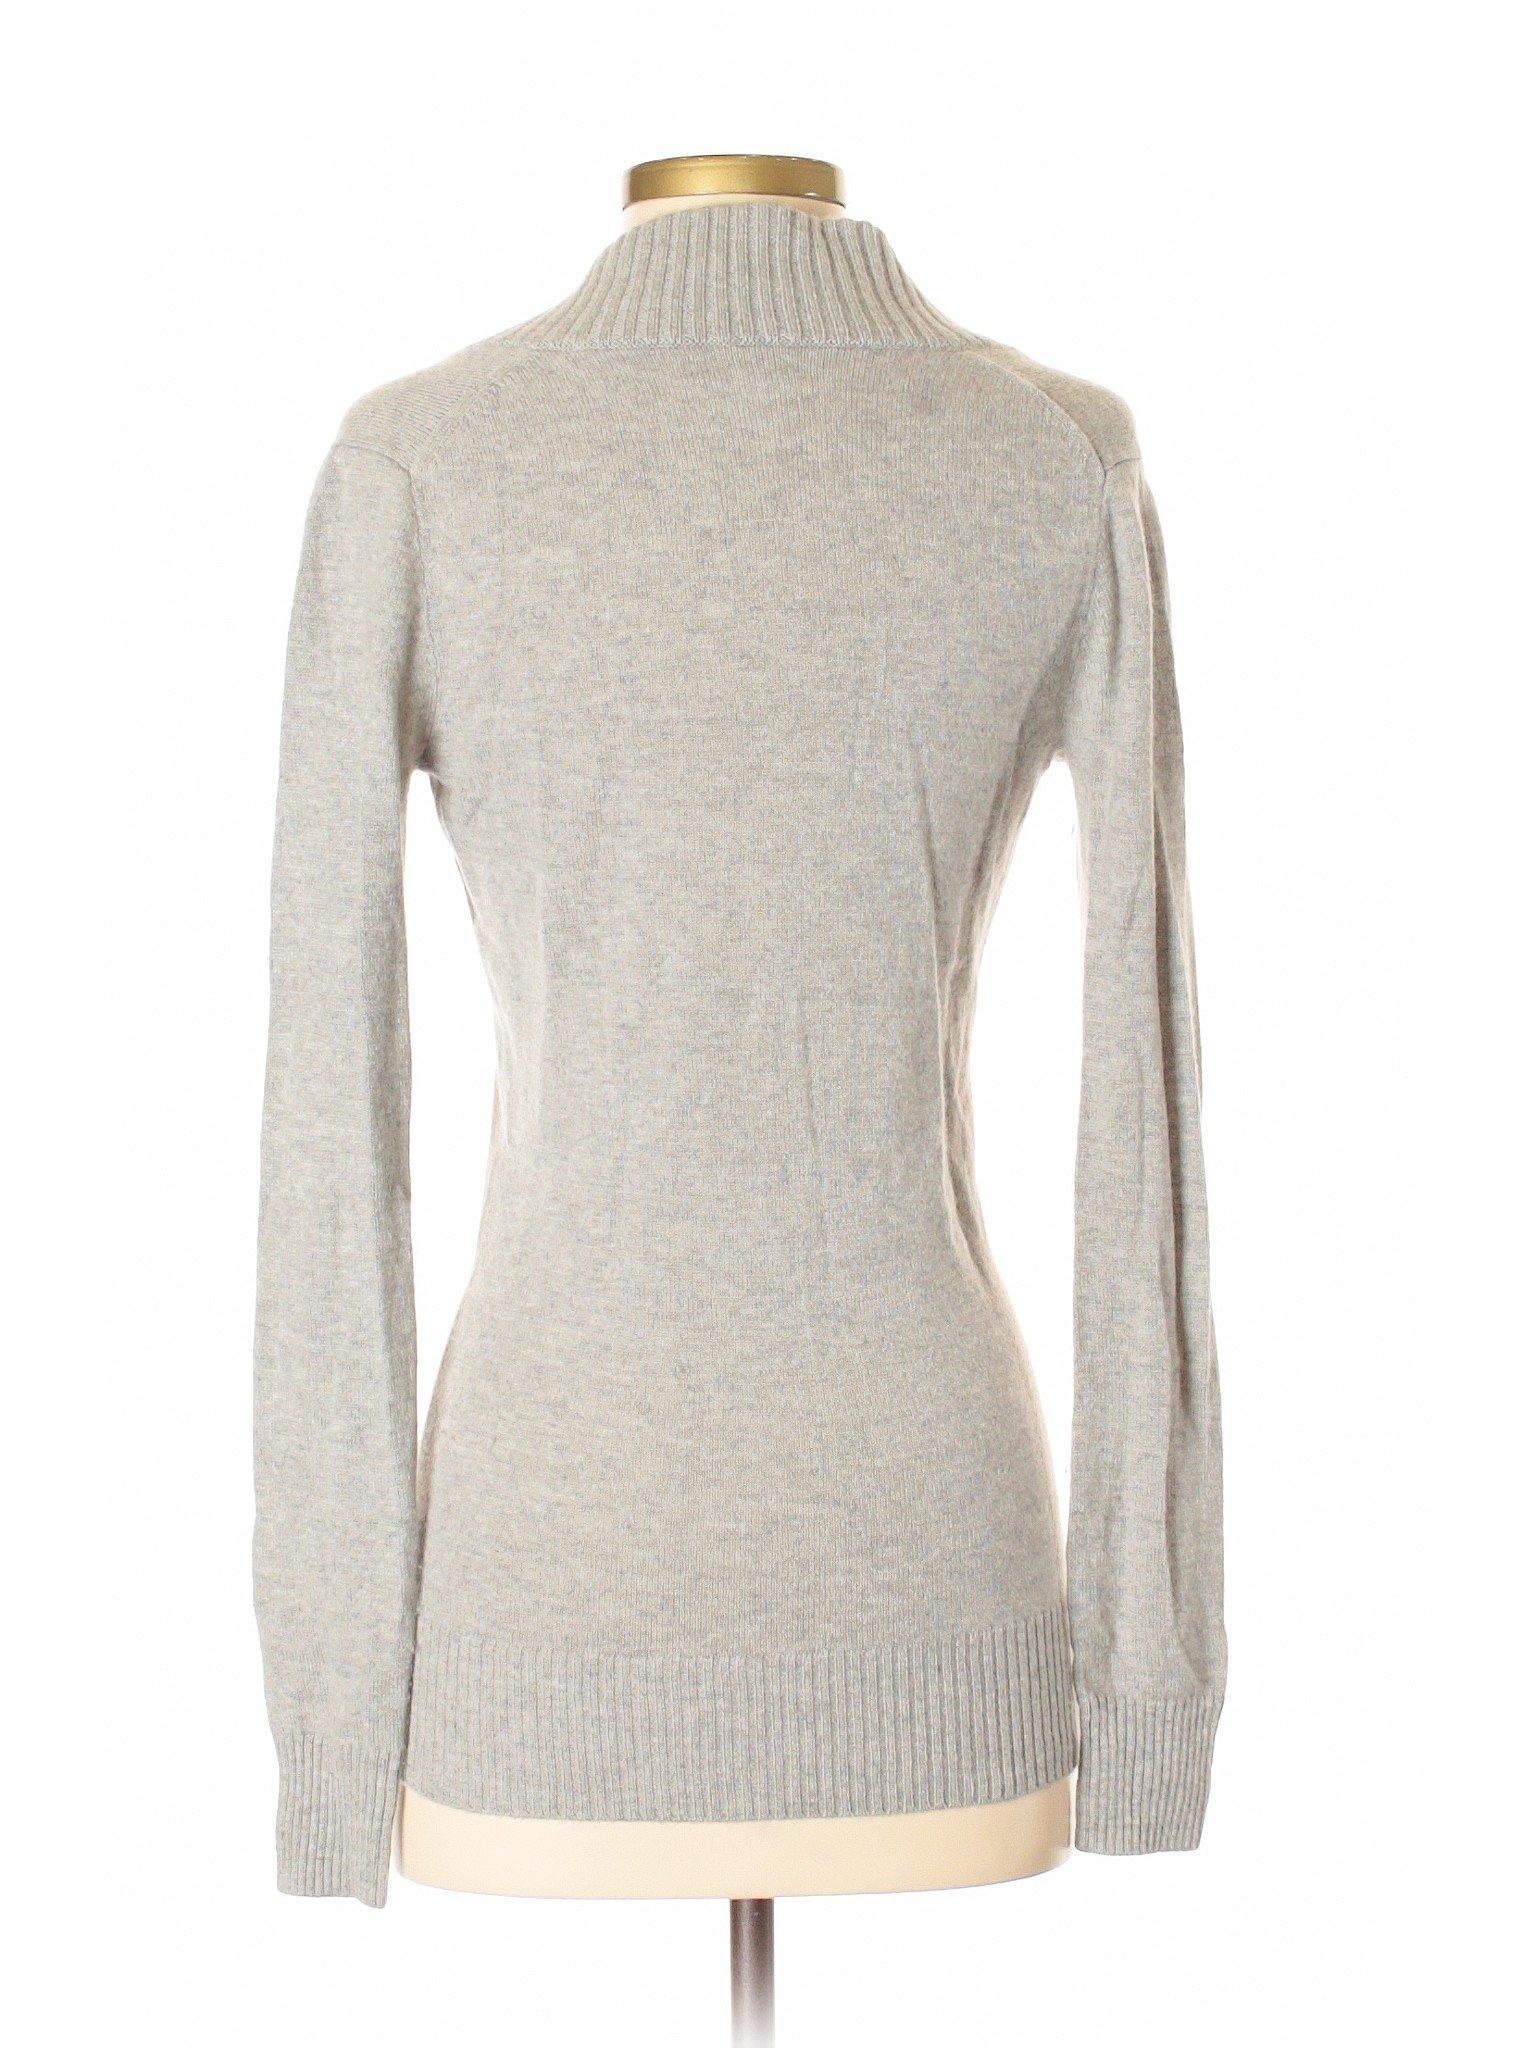 Boutique J Pullover Crew Cashmere Sweater 78c1Wq7g